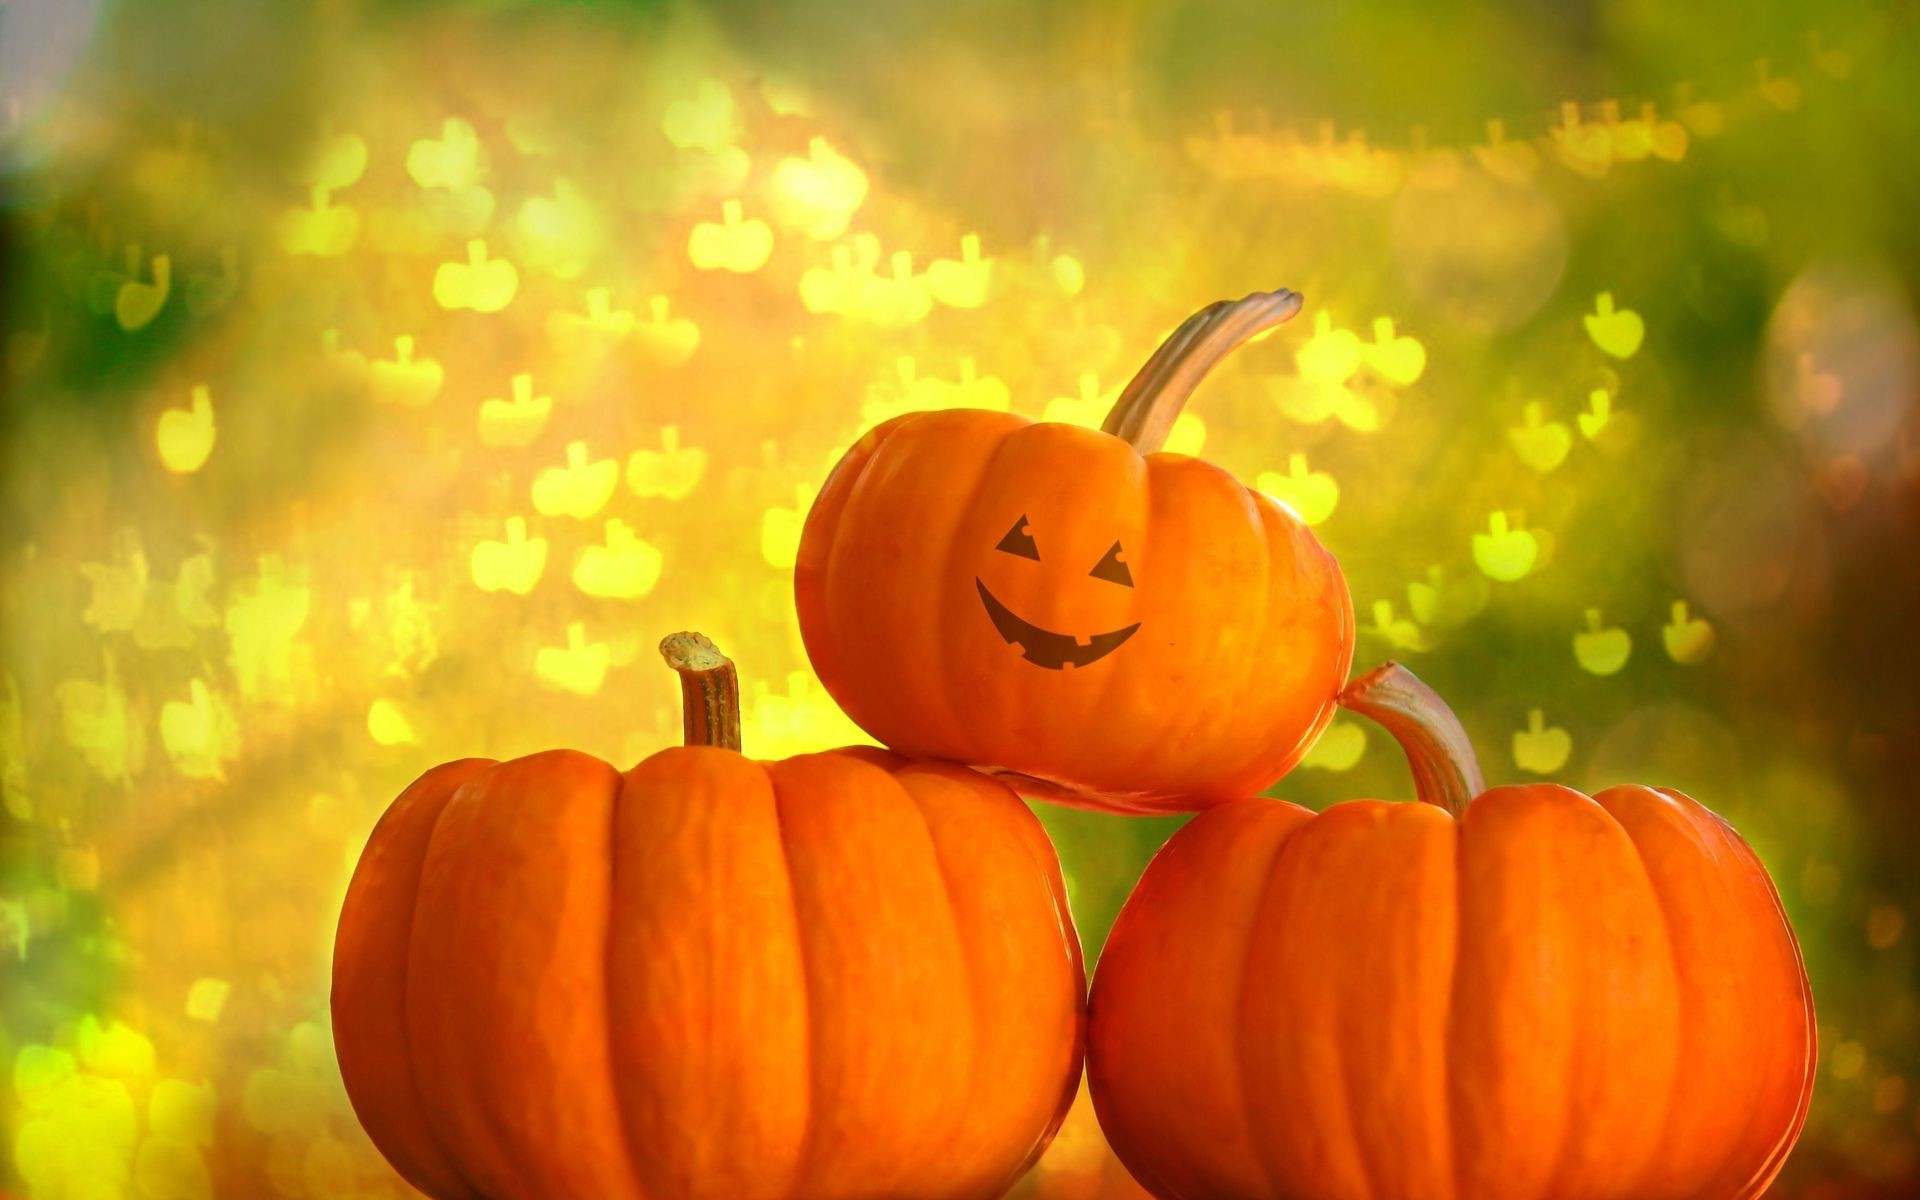 Halloween Pumpkins Desktop Wallpaper – WallpaperSafari. Halloween Pumpkins  Desktop Wallpaper WallpaperSafari